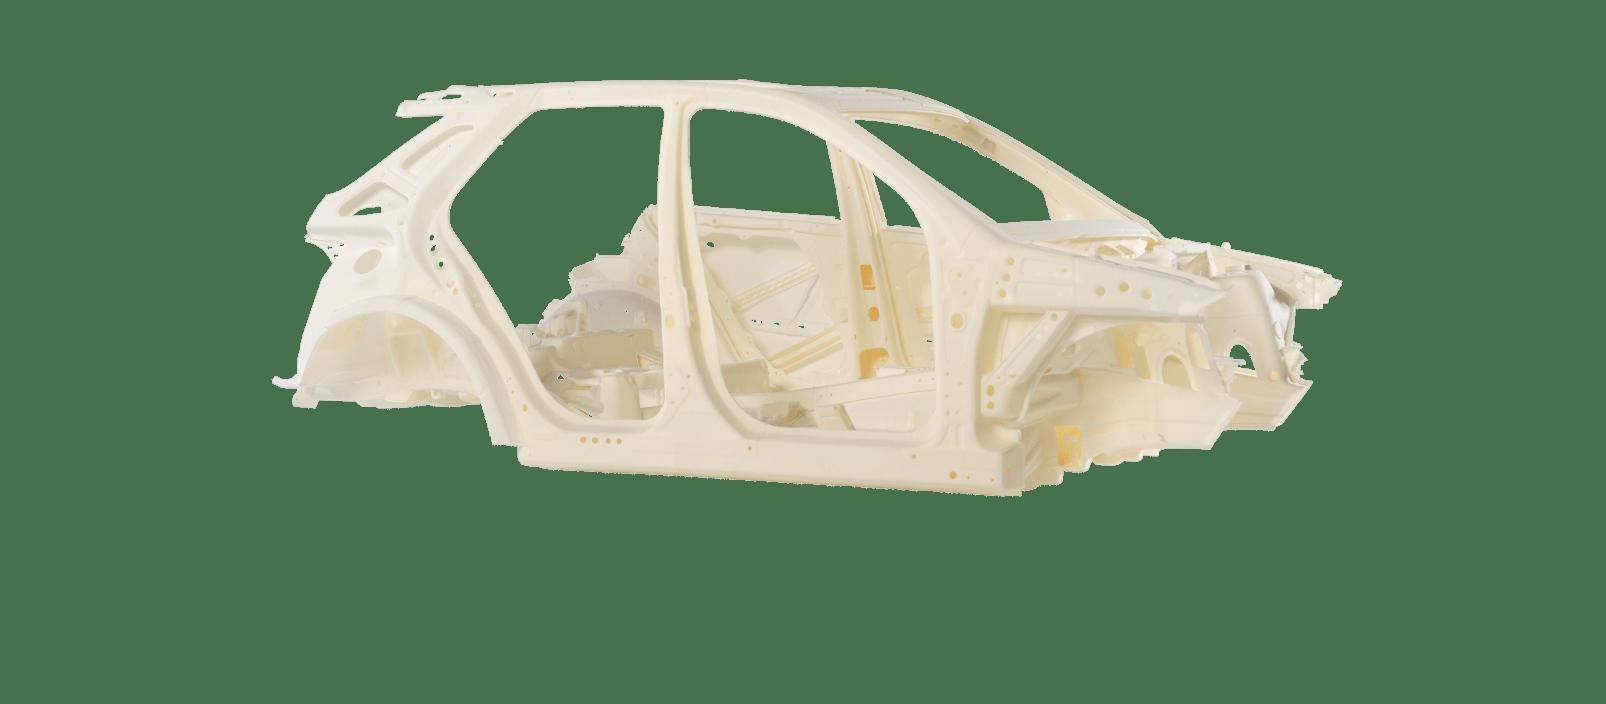 Prototypenbau 3D-Druck SLS